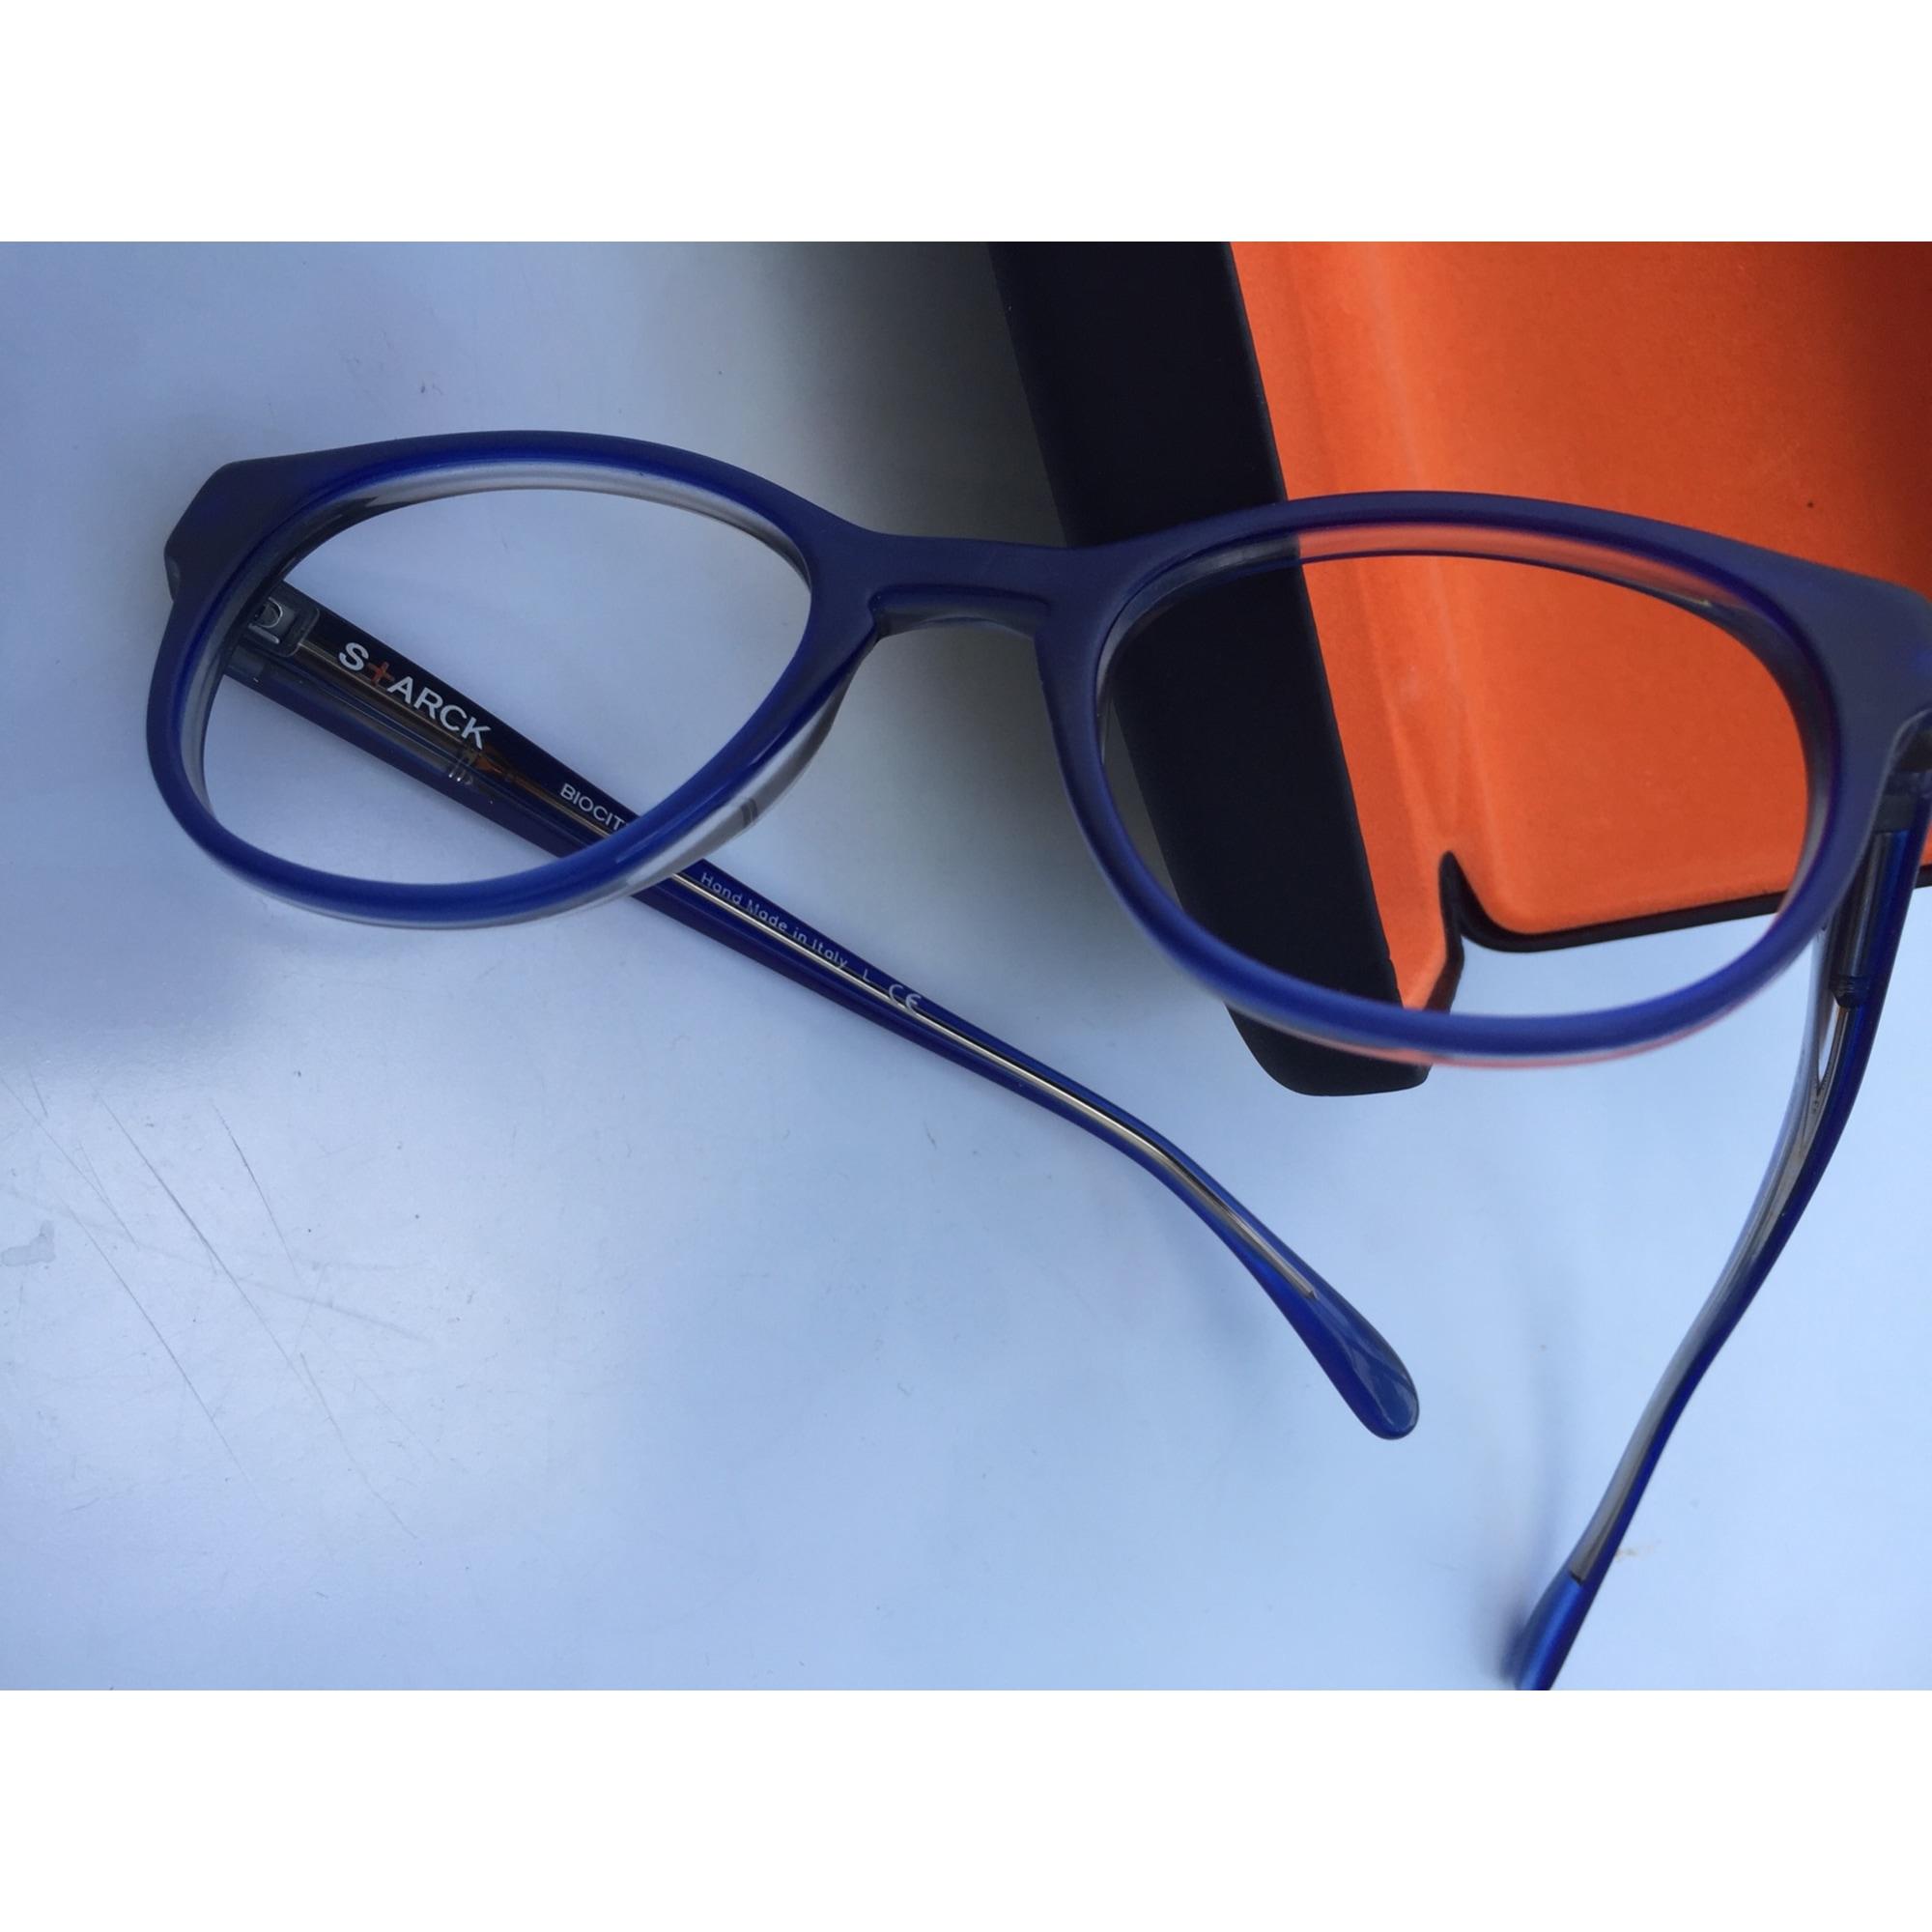 2d8977f7284461 Monture de lunettes STARCK - ALAIN MIKLI bleu - 4820831